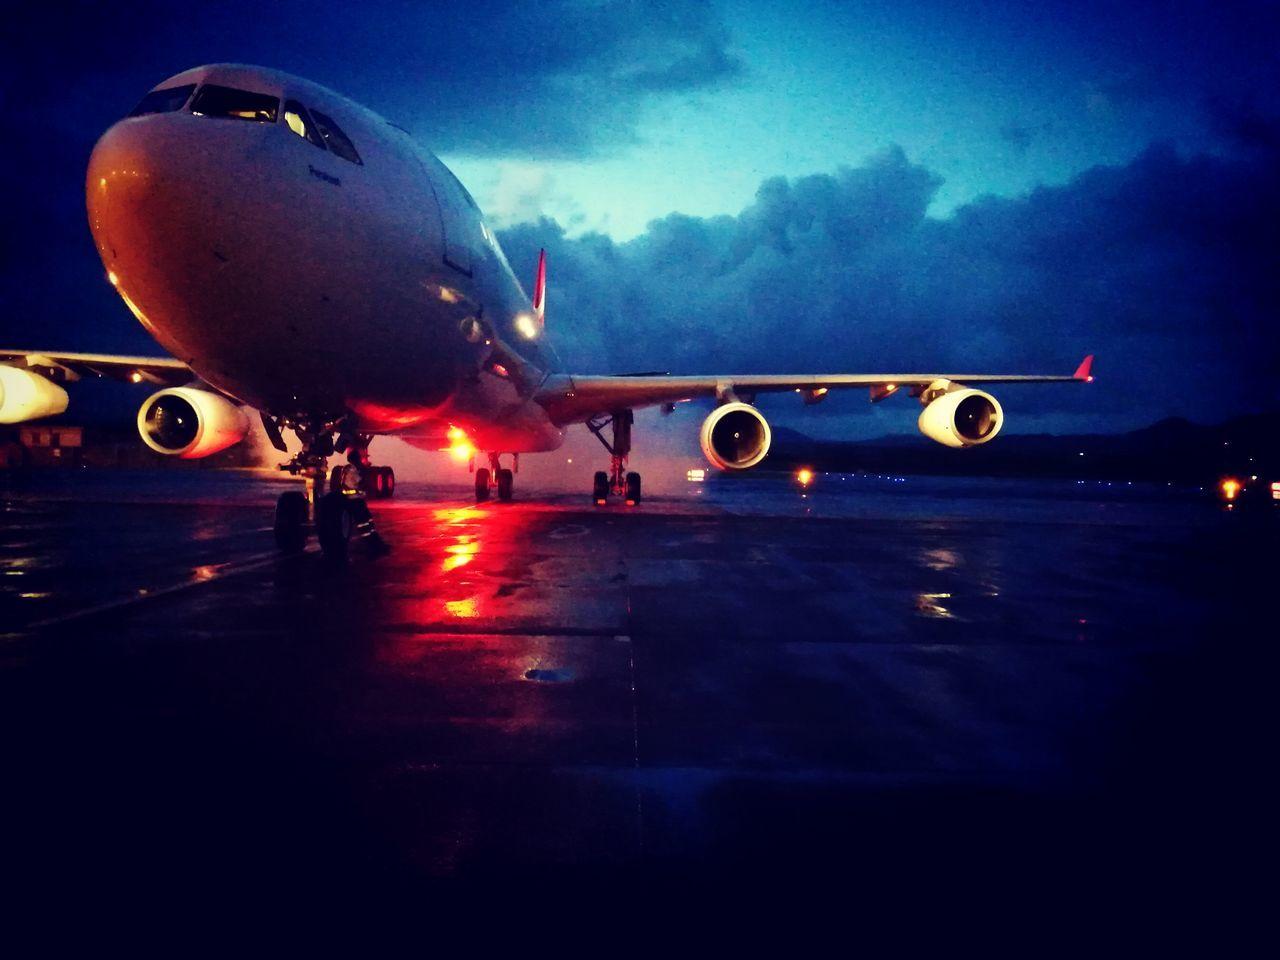 Airplane Airport Runway Avgeek Aircraftmechanic Aircraft Spotting AircraftMaintenance Aerospace Industry Airmauritius360 Leica Huawei P9 Mauritius Aircraft A340 CFM Airmauritius Airport Rainy Days☔ Sky Flying High